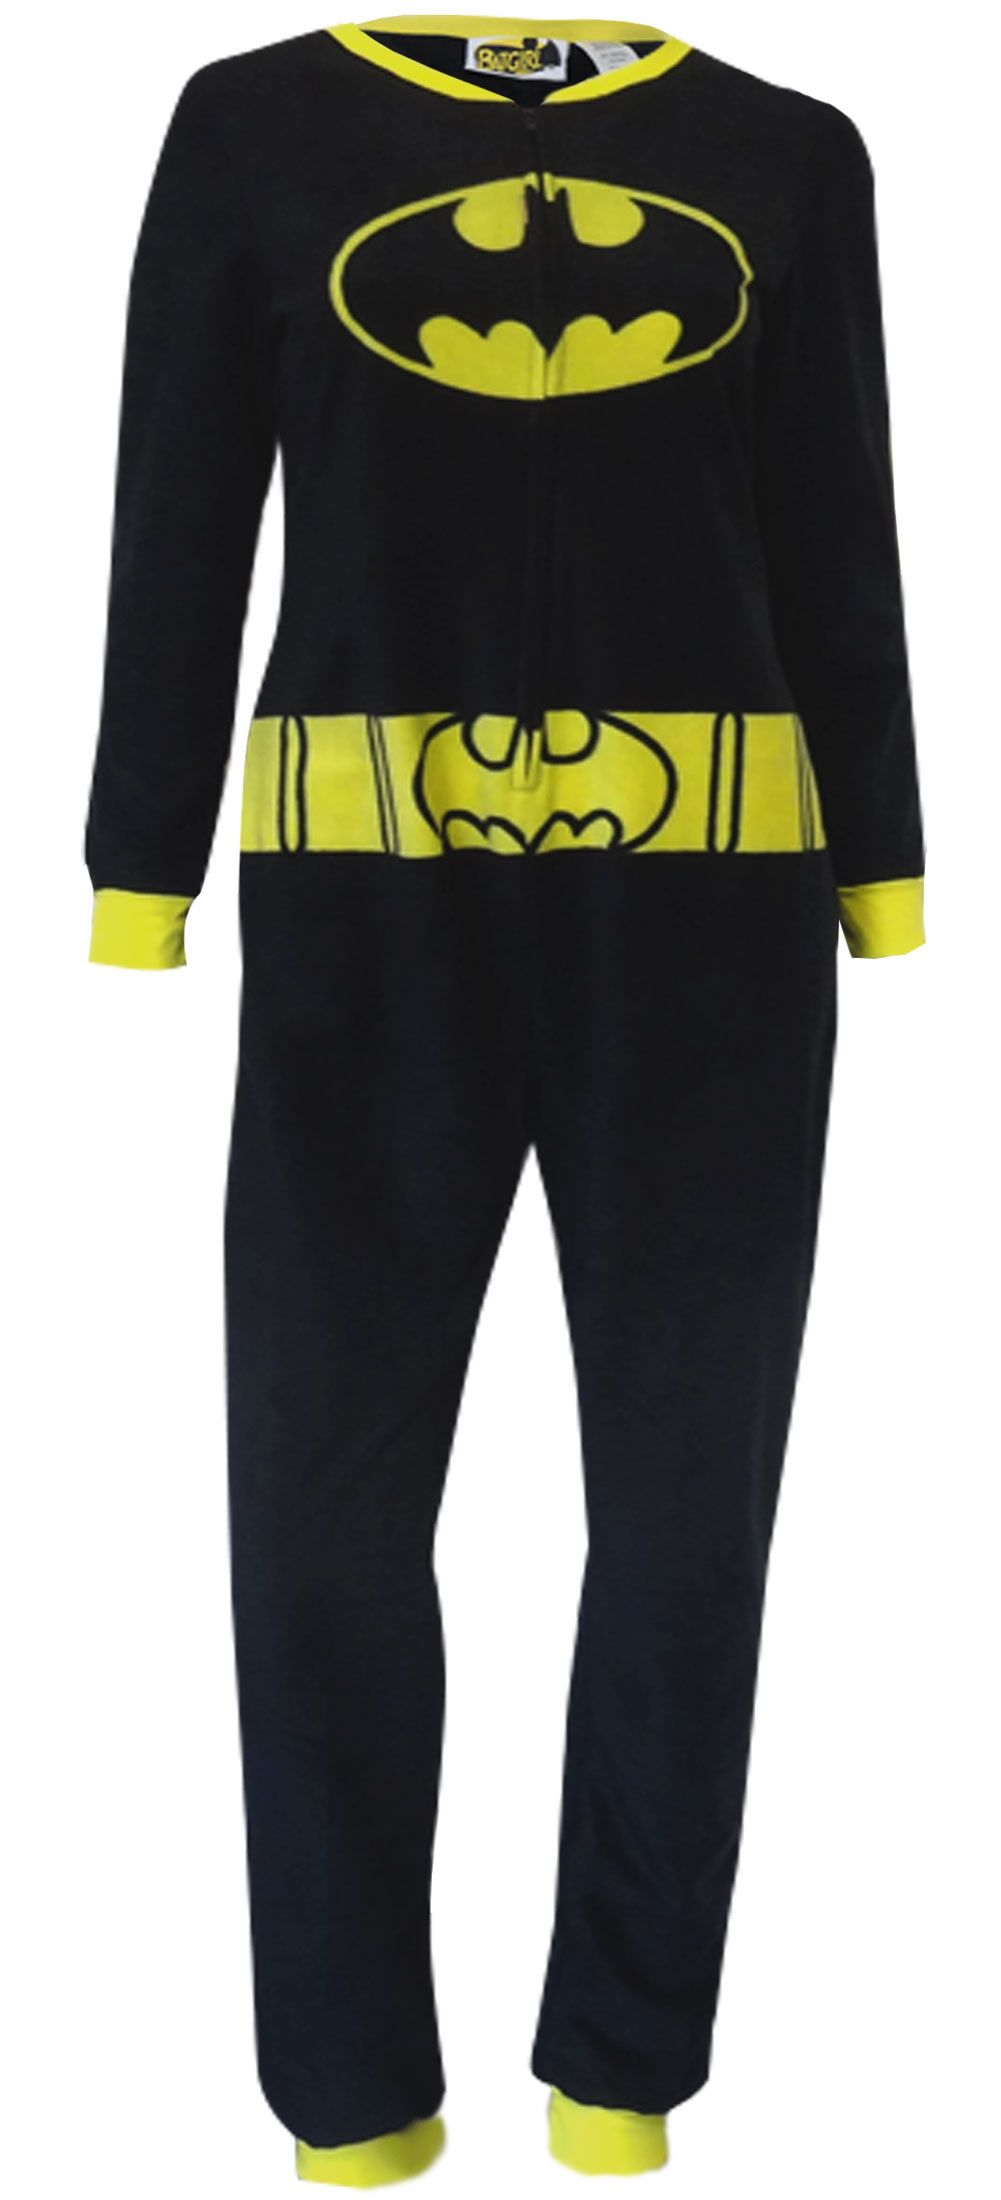 52d2b955f6 WebUndies.com DC Comics Batgirl Fleece Onesie Pajama